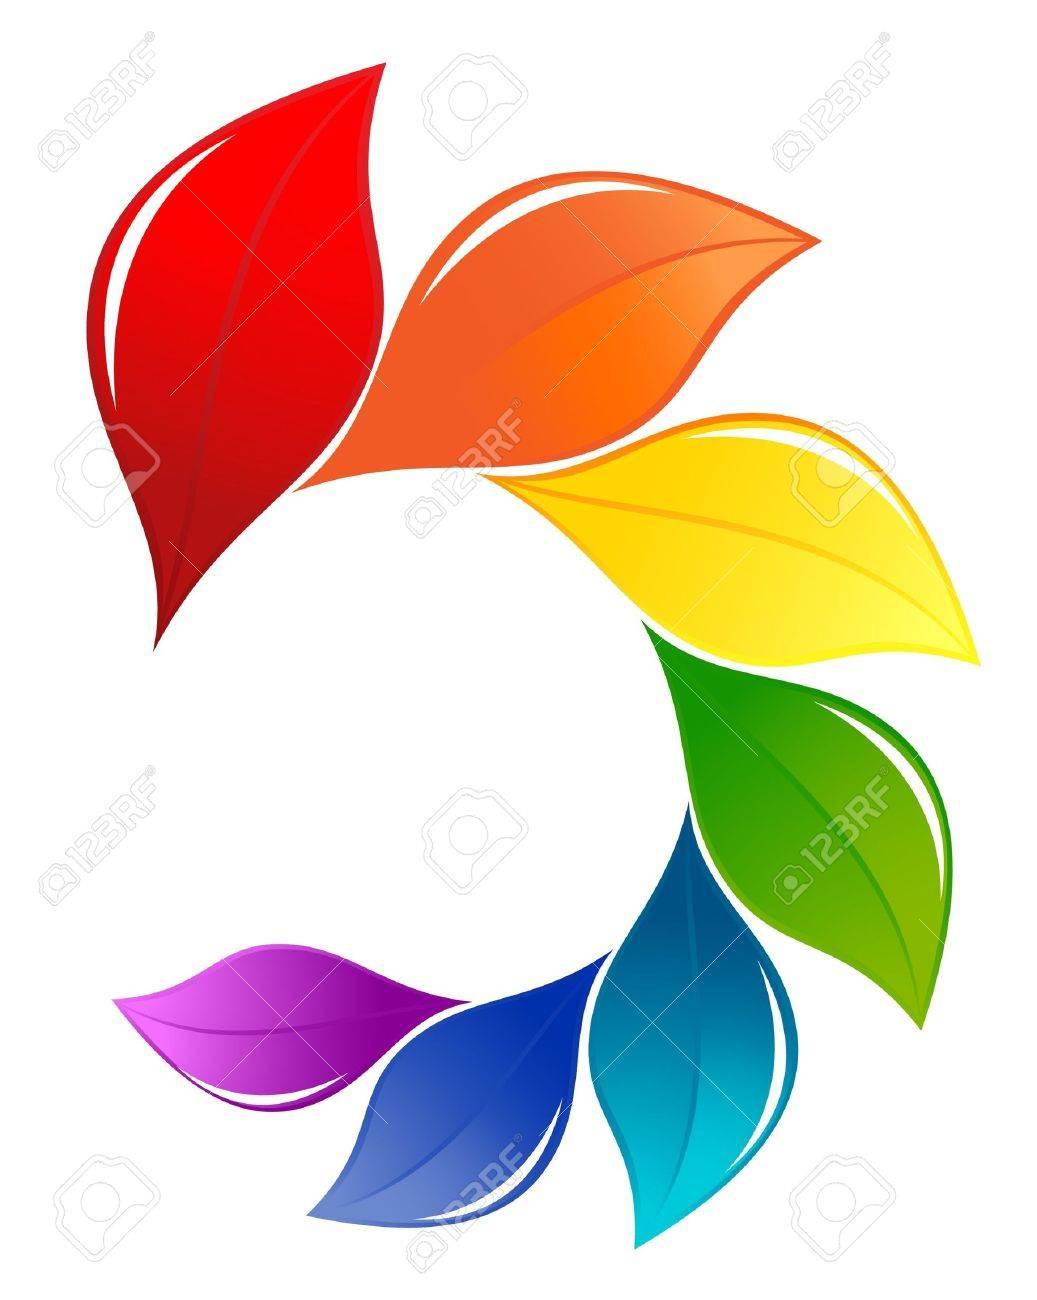 Nature design element in spectrum colors Stock Vector - 13596789